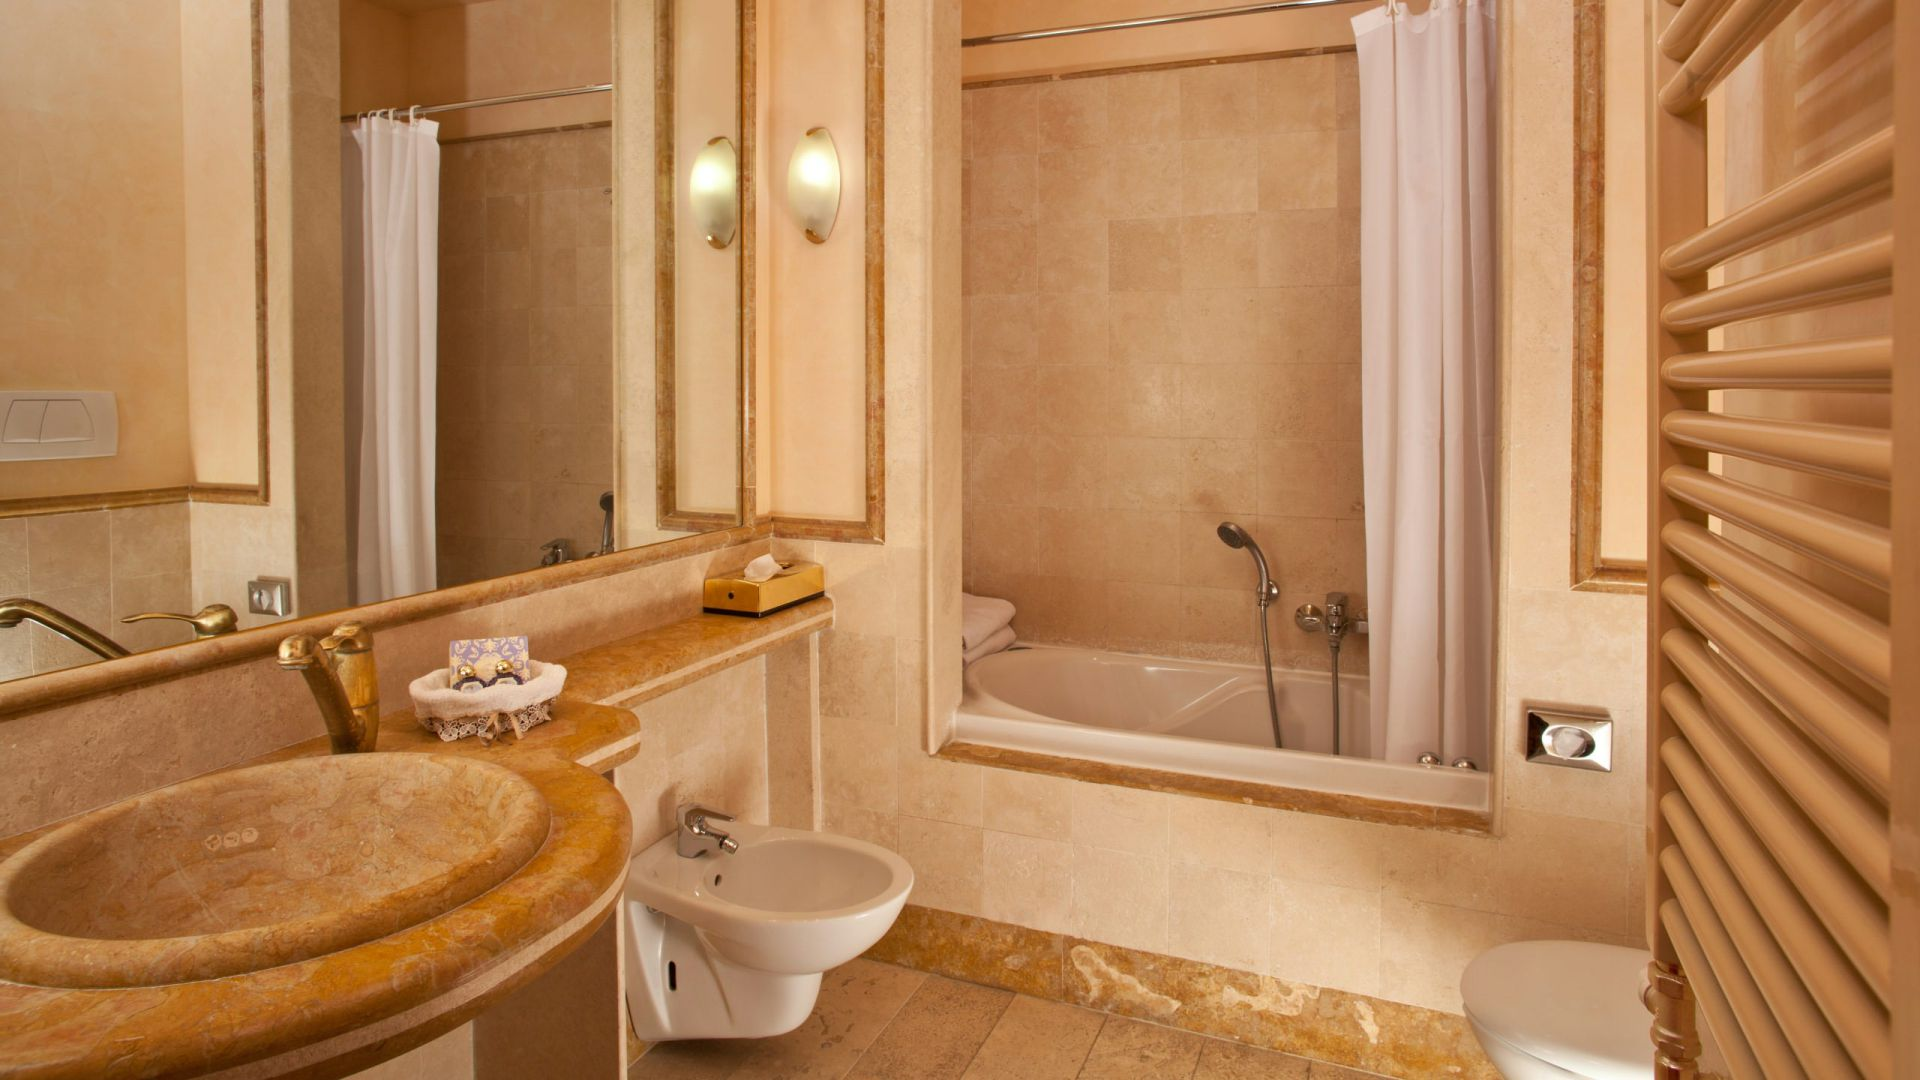 albergo-ottocento-rome-bathroom-18